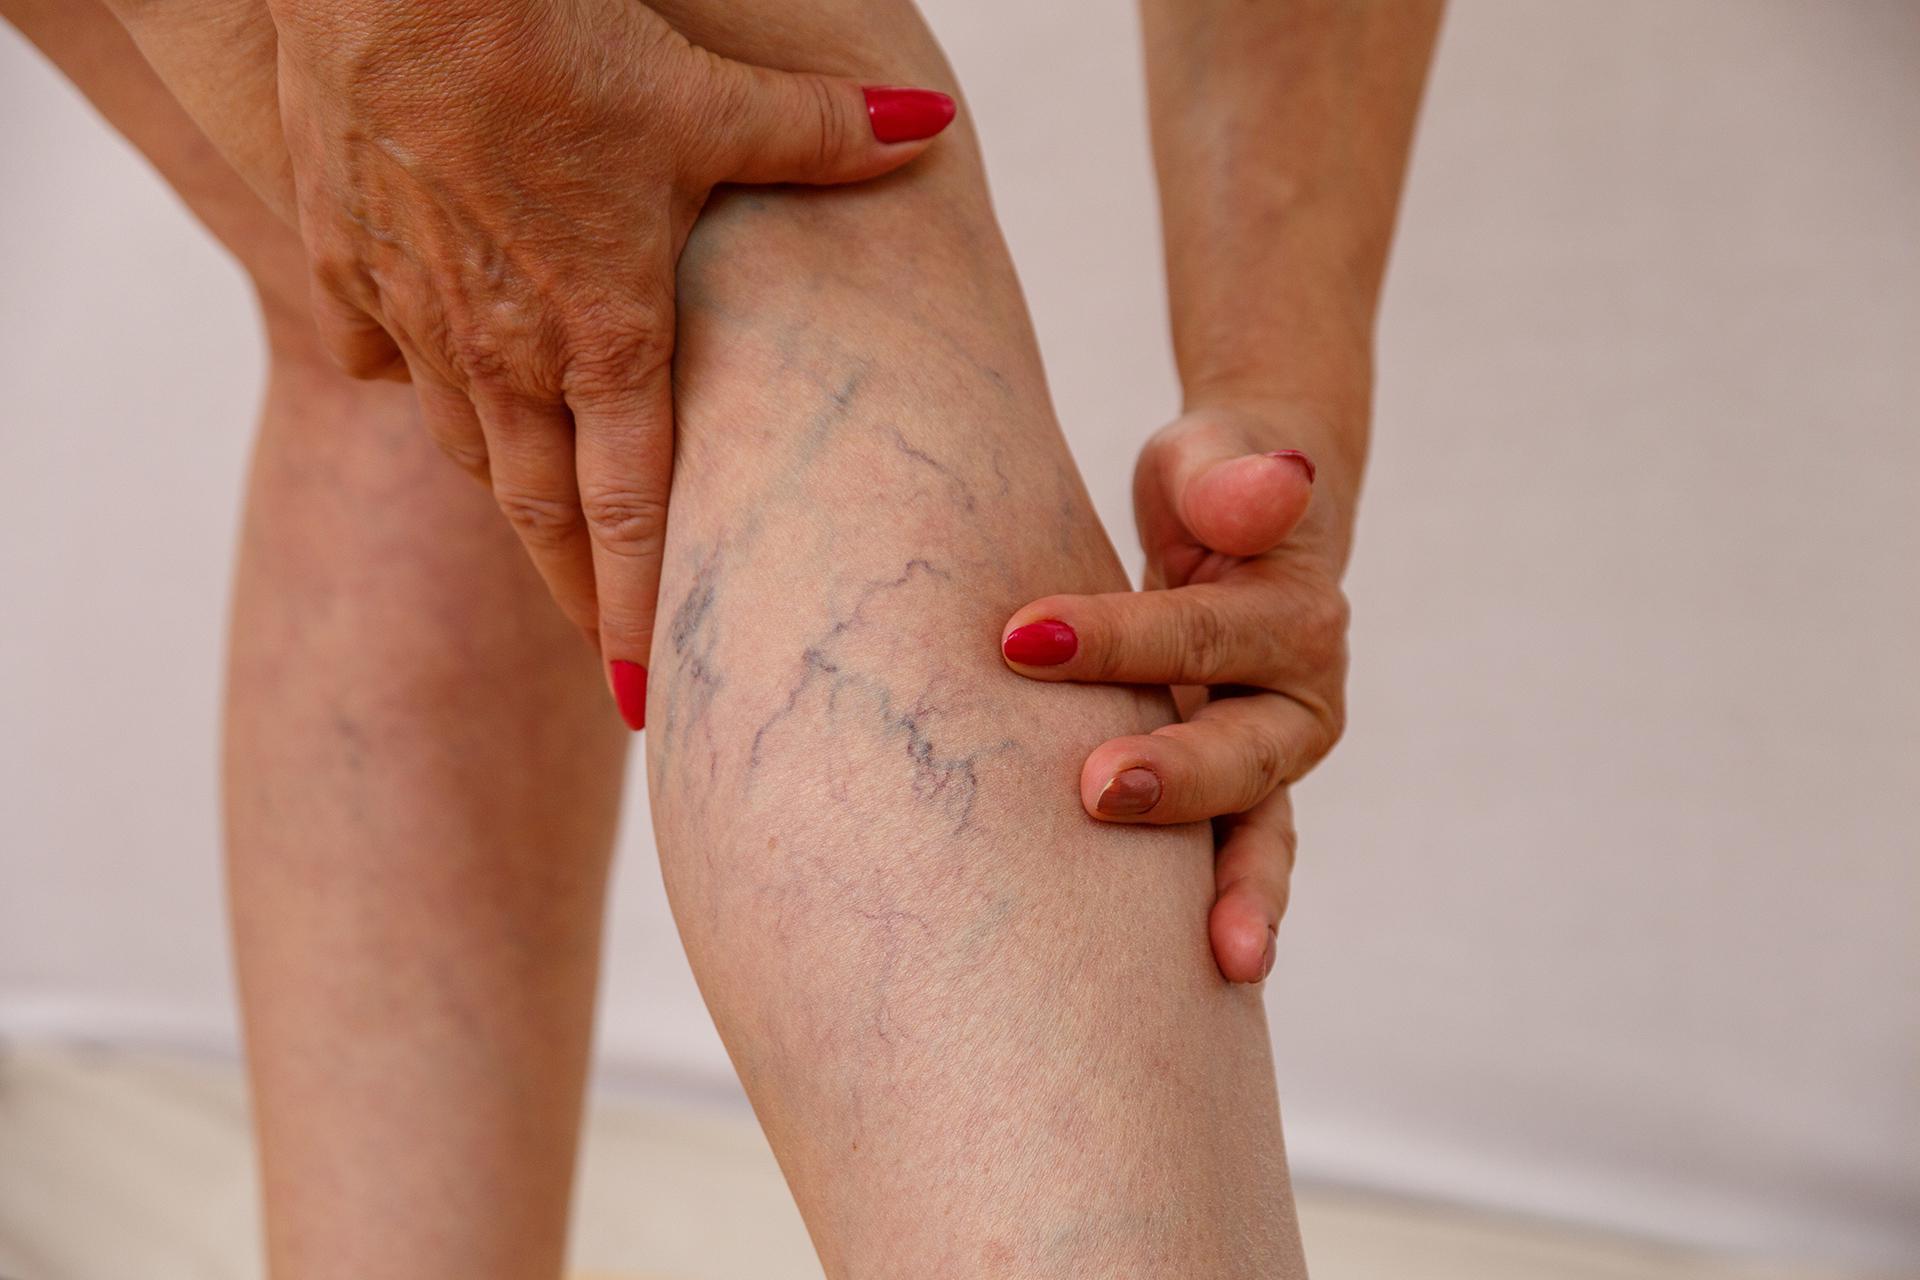 vascular-issues-requiring-leg-pain-doctor-Lake-Hughes